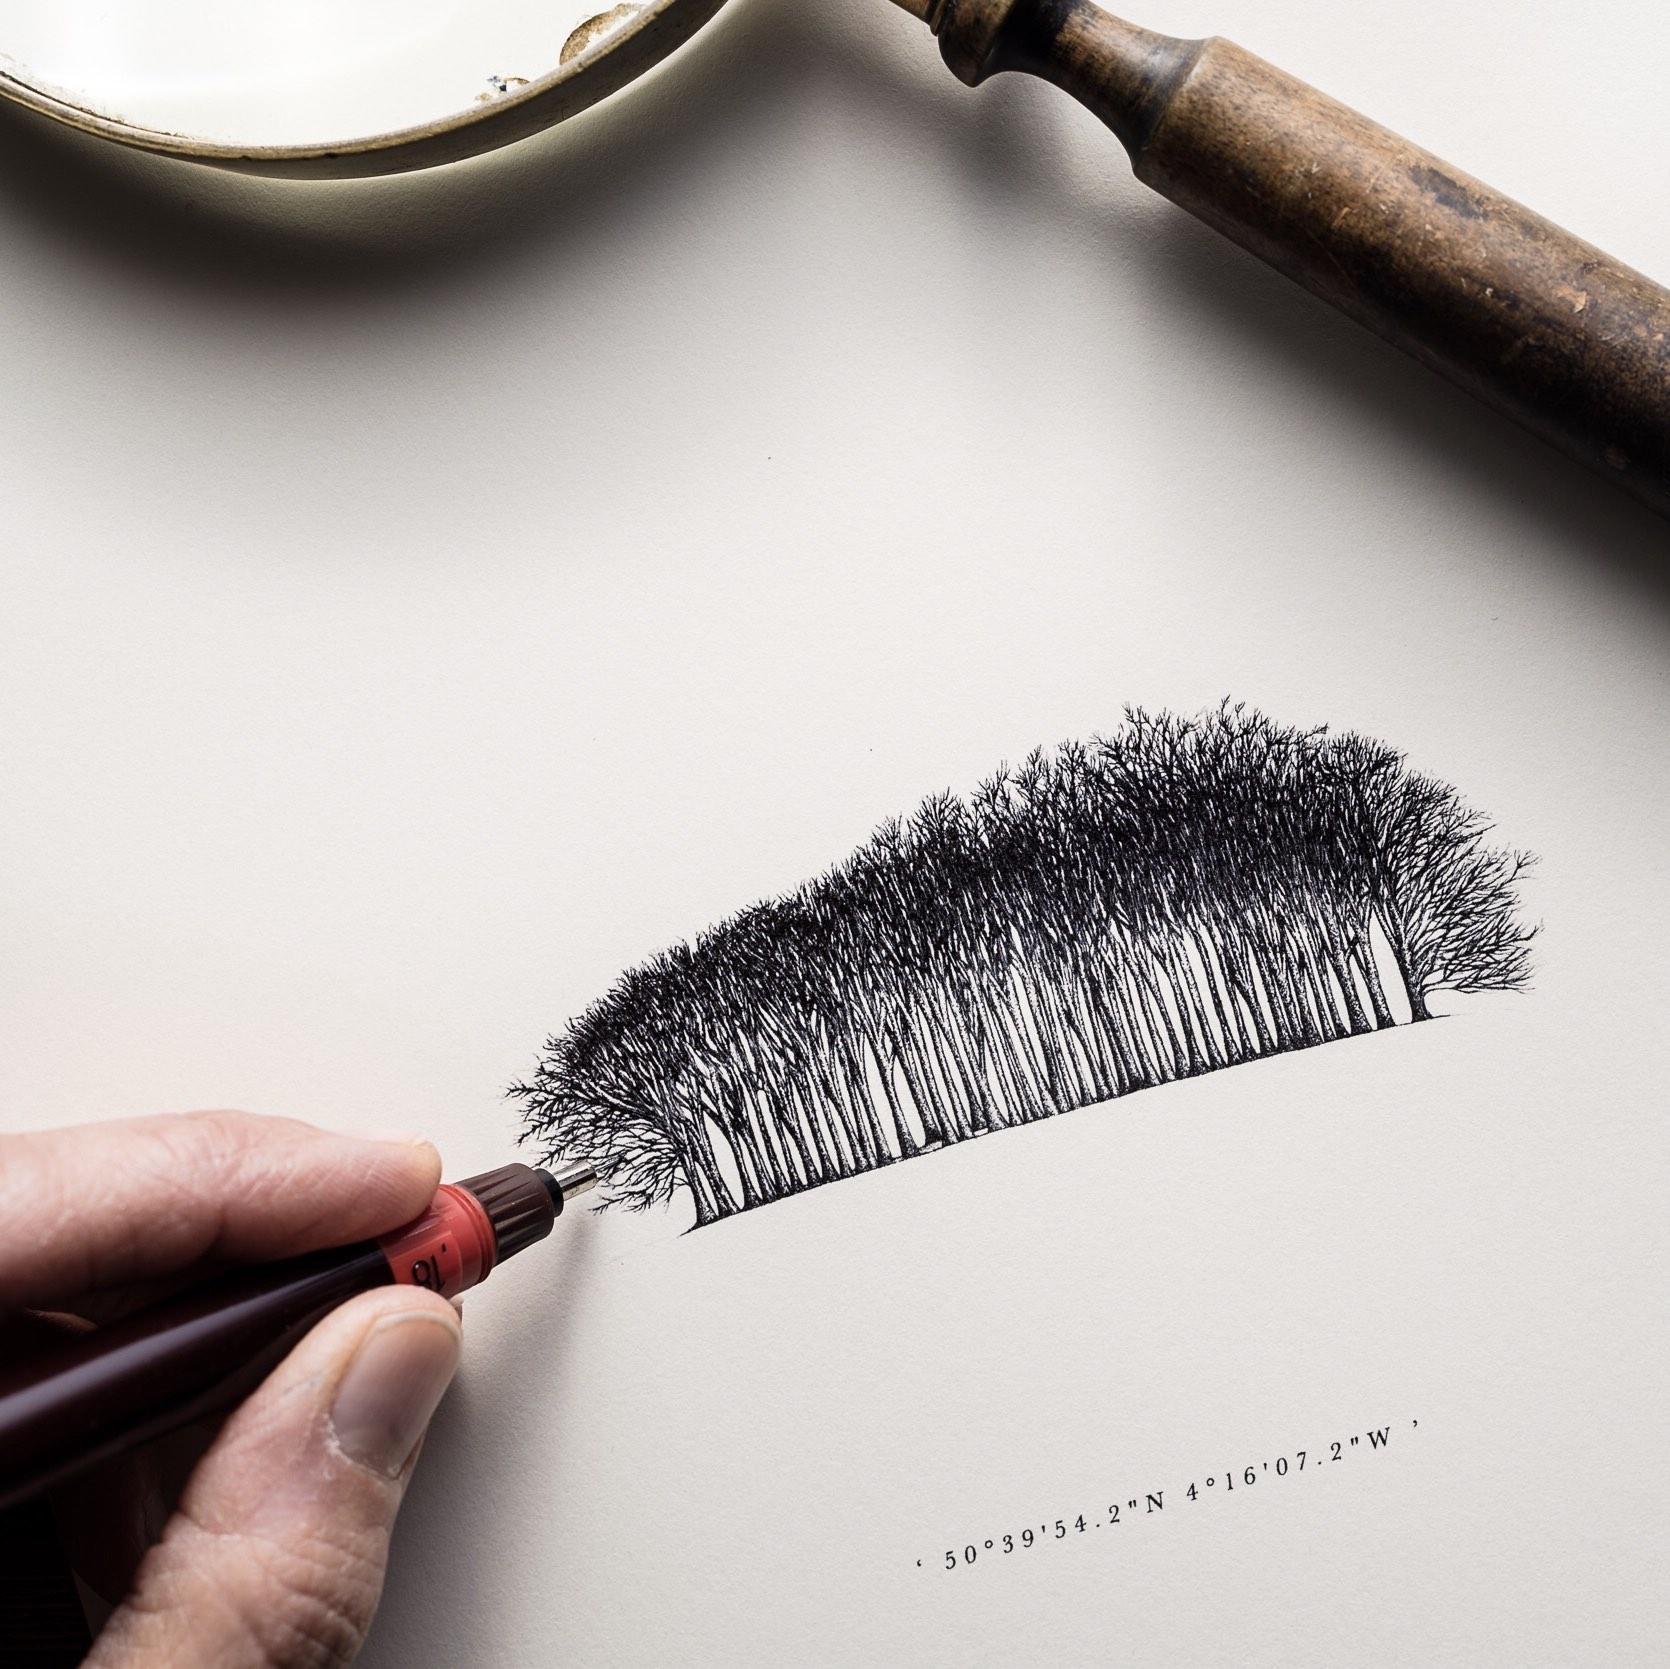 Cornish Copse | Being Drawn | Close Up